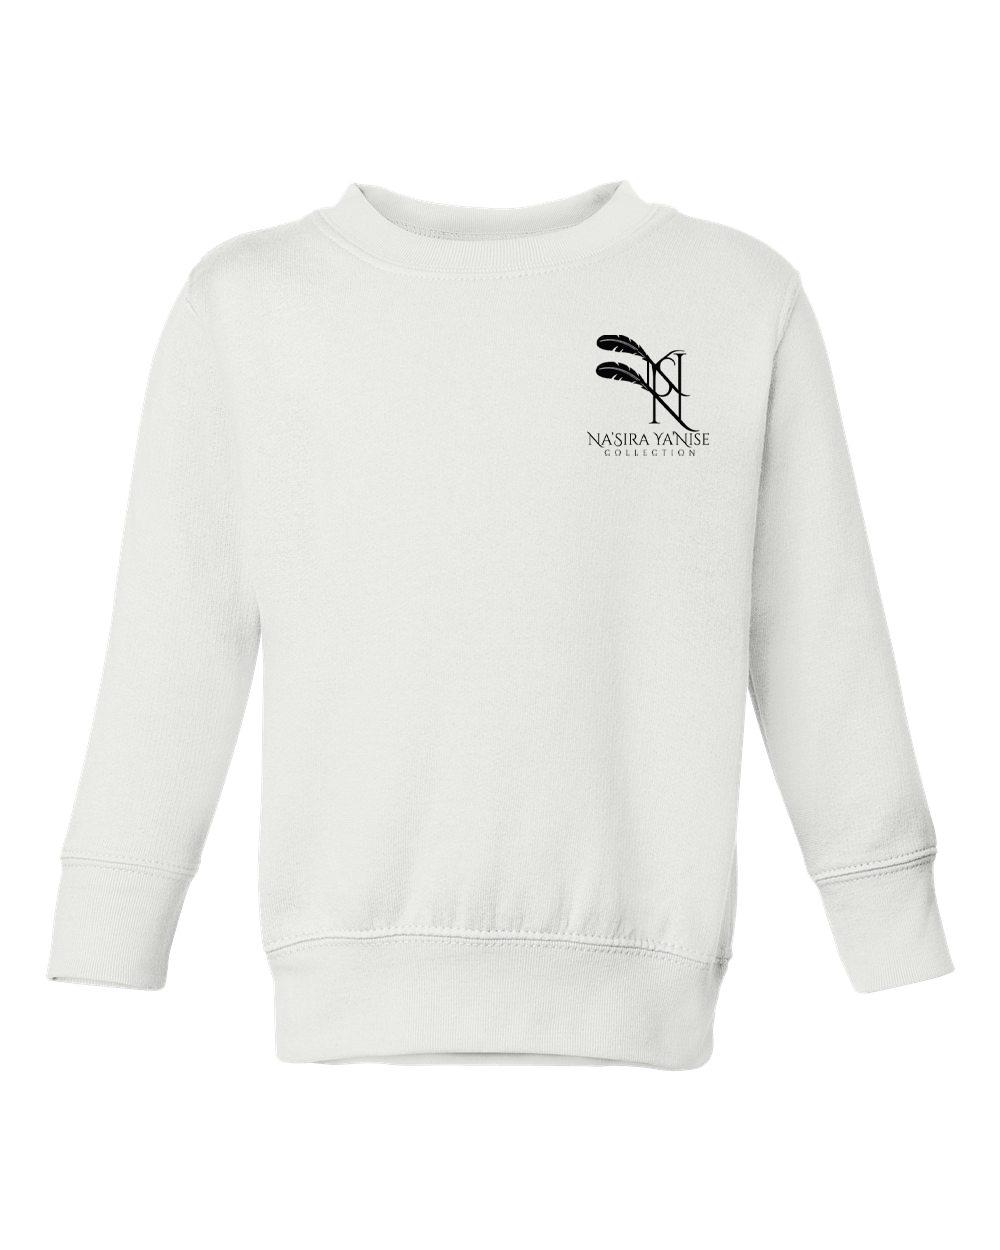 custom design of Rabbit Skins 3317 Toddler/Juvy Crewneck Sweatshirt